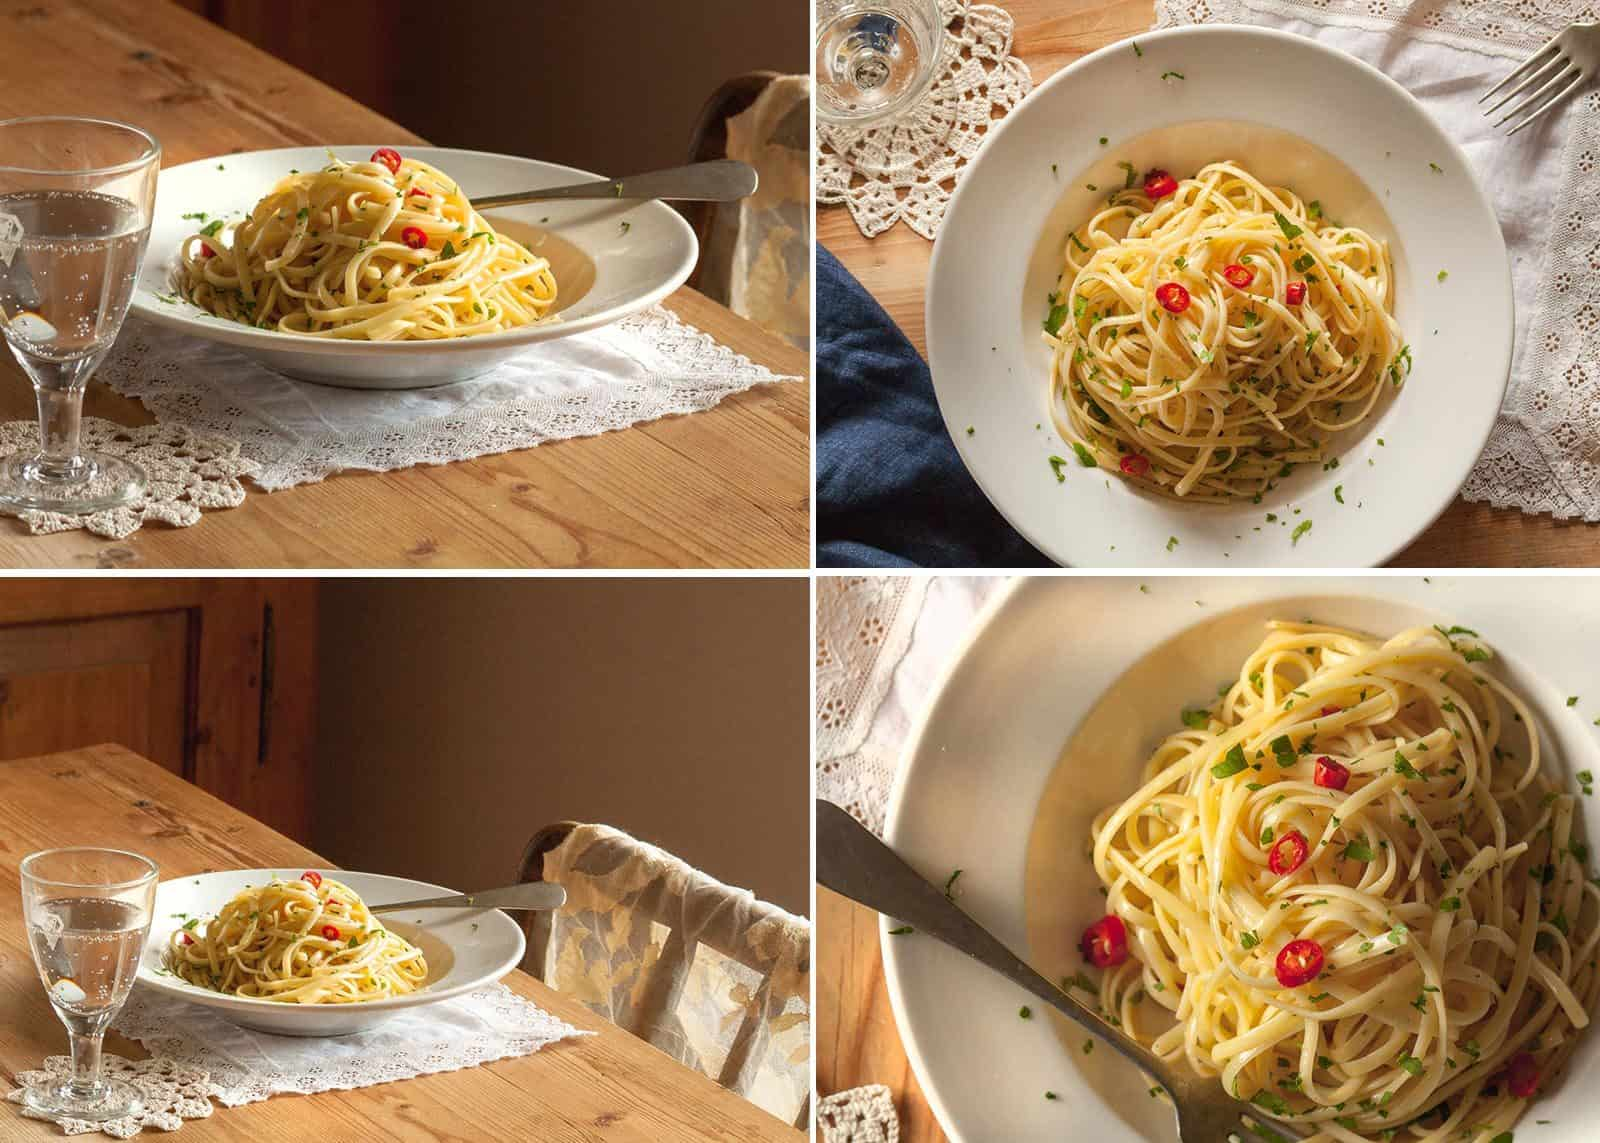 pasta dish - aglio olio peperoncino